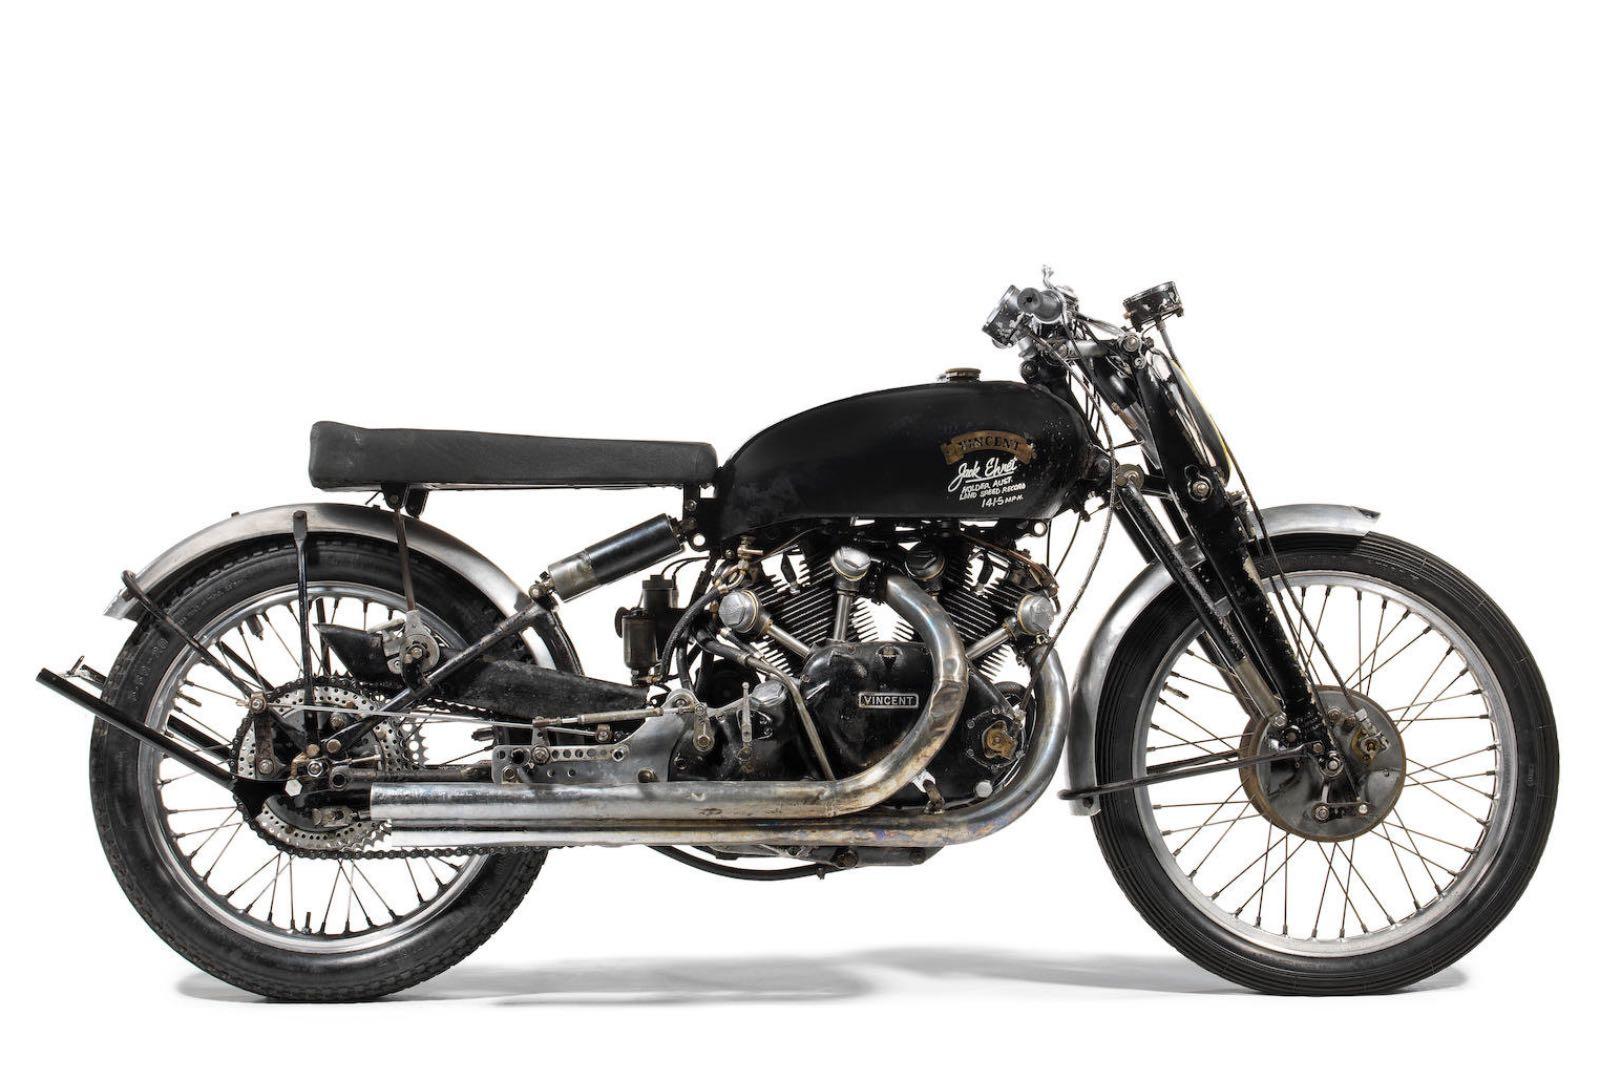 vincent lightning motorcycles most 1951 expensive motorcycle valuable custom sportster tops davidson d1 harley 1200